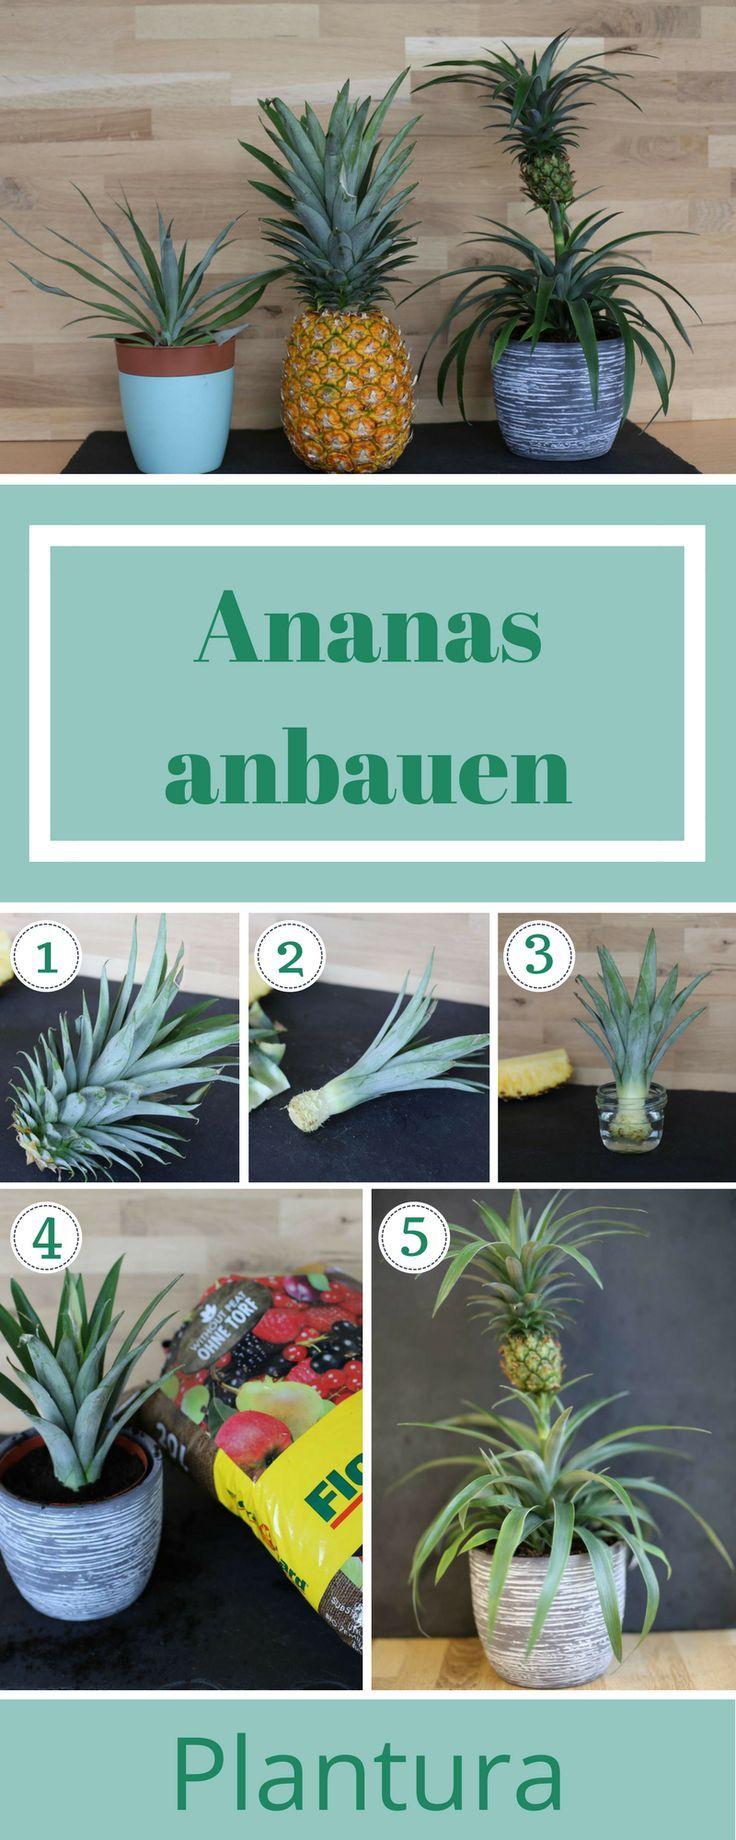 ananas anpflanzen vermehrung anbau anleitung diy garten ideen blumen anpflanzen wohnung. Black Bedroom Furniture Sets. Home Design Ideas